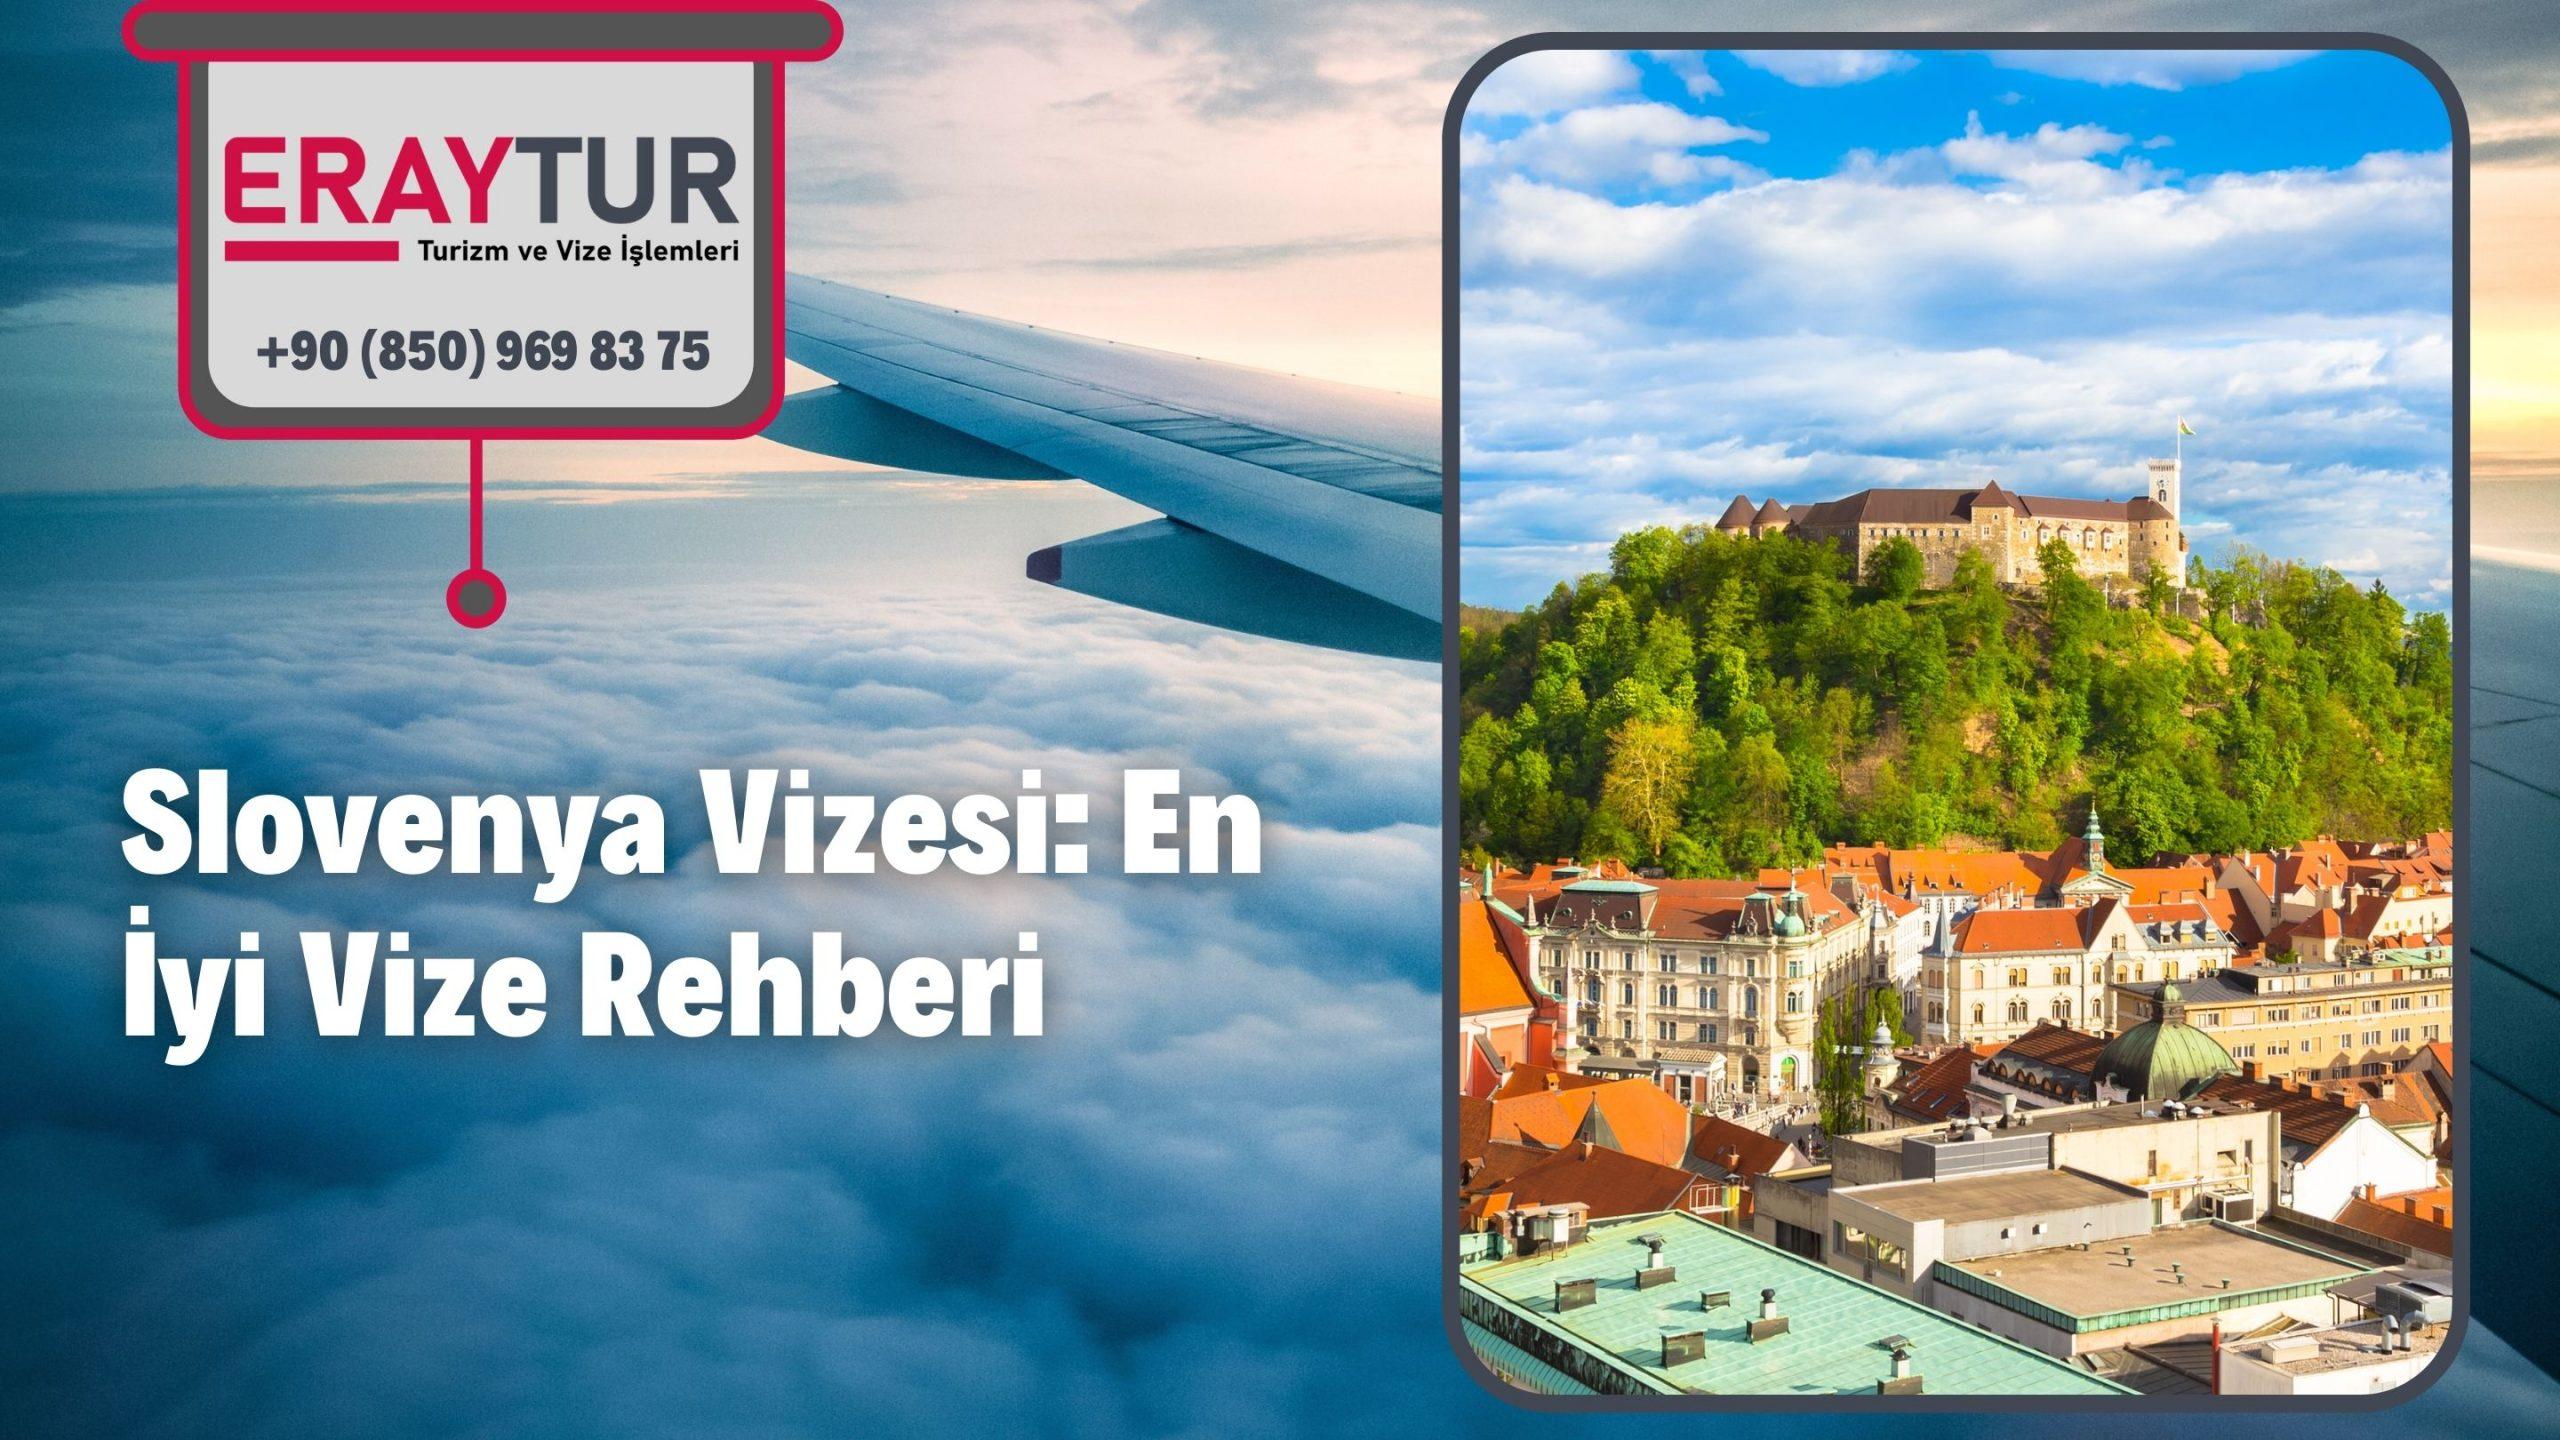 Slovenya Vizesi: En İyi Vize Rehberi 2021